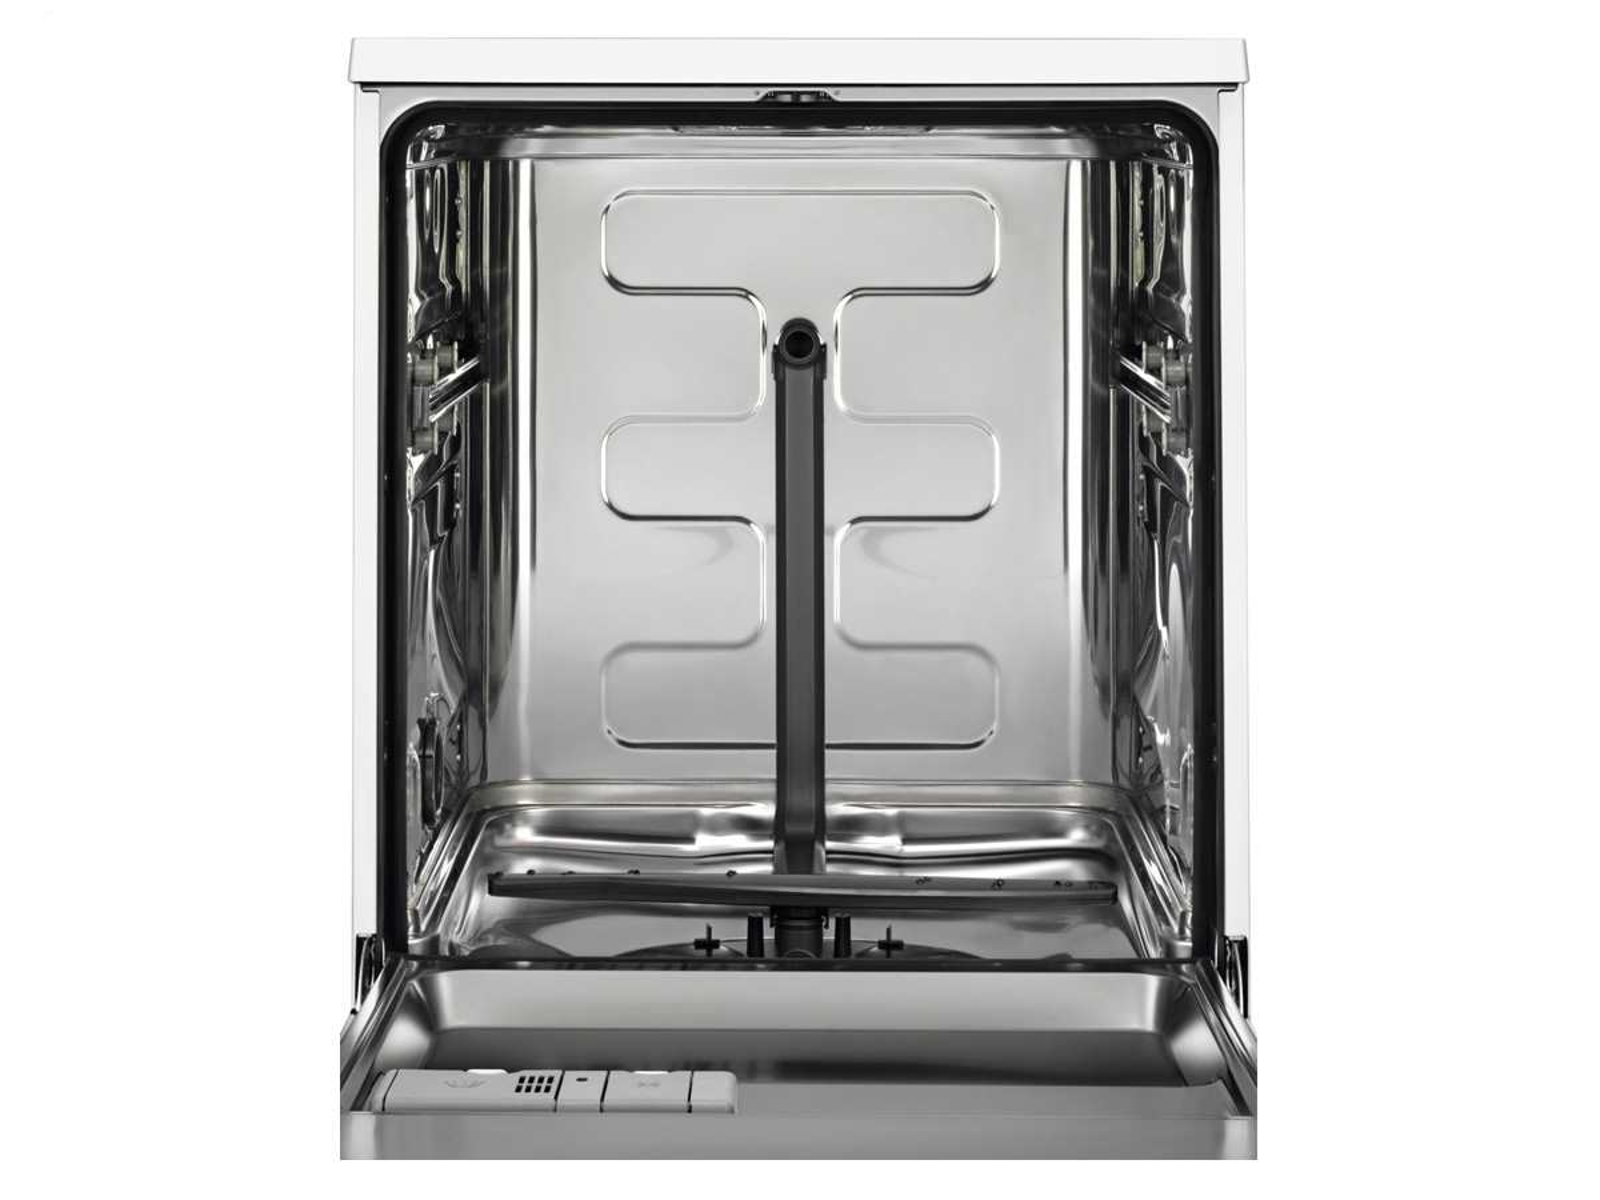 Aeg Kühlschrank Inbetriebnahme : Aeg fsb52600z vollintegrierbarer einbaugeschirrspüler